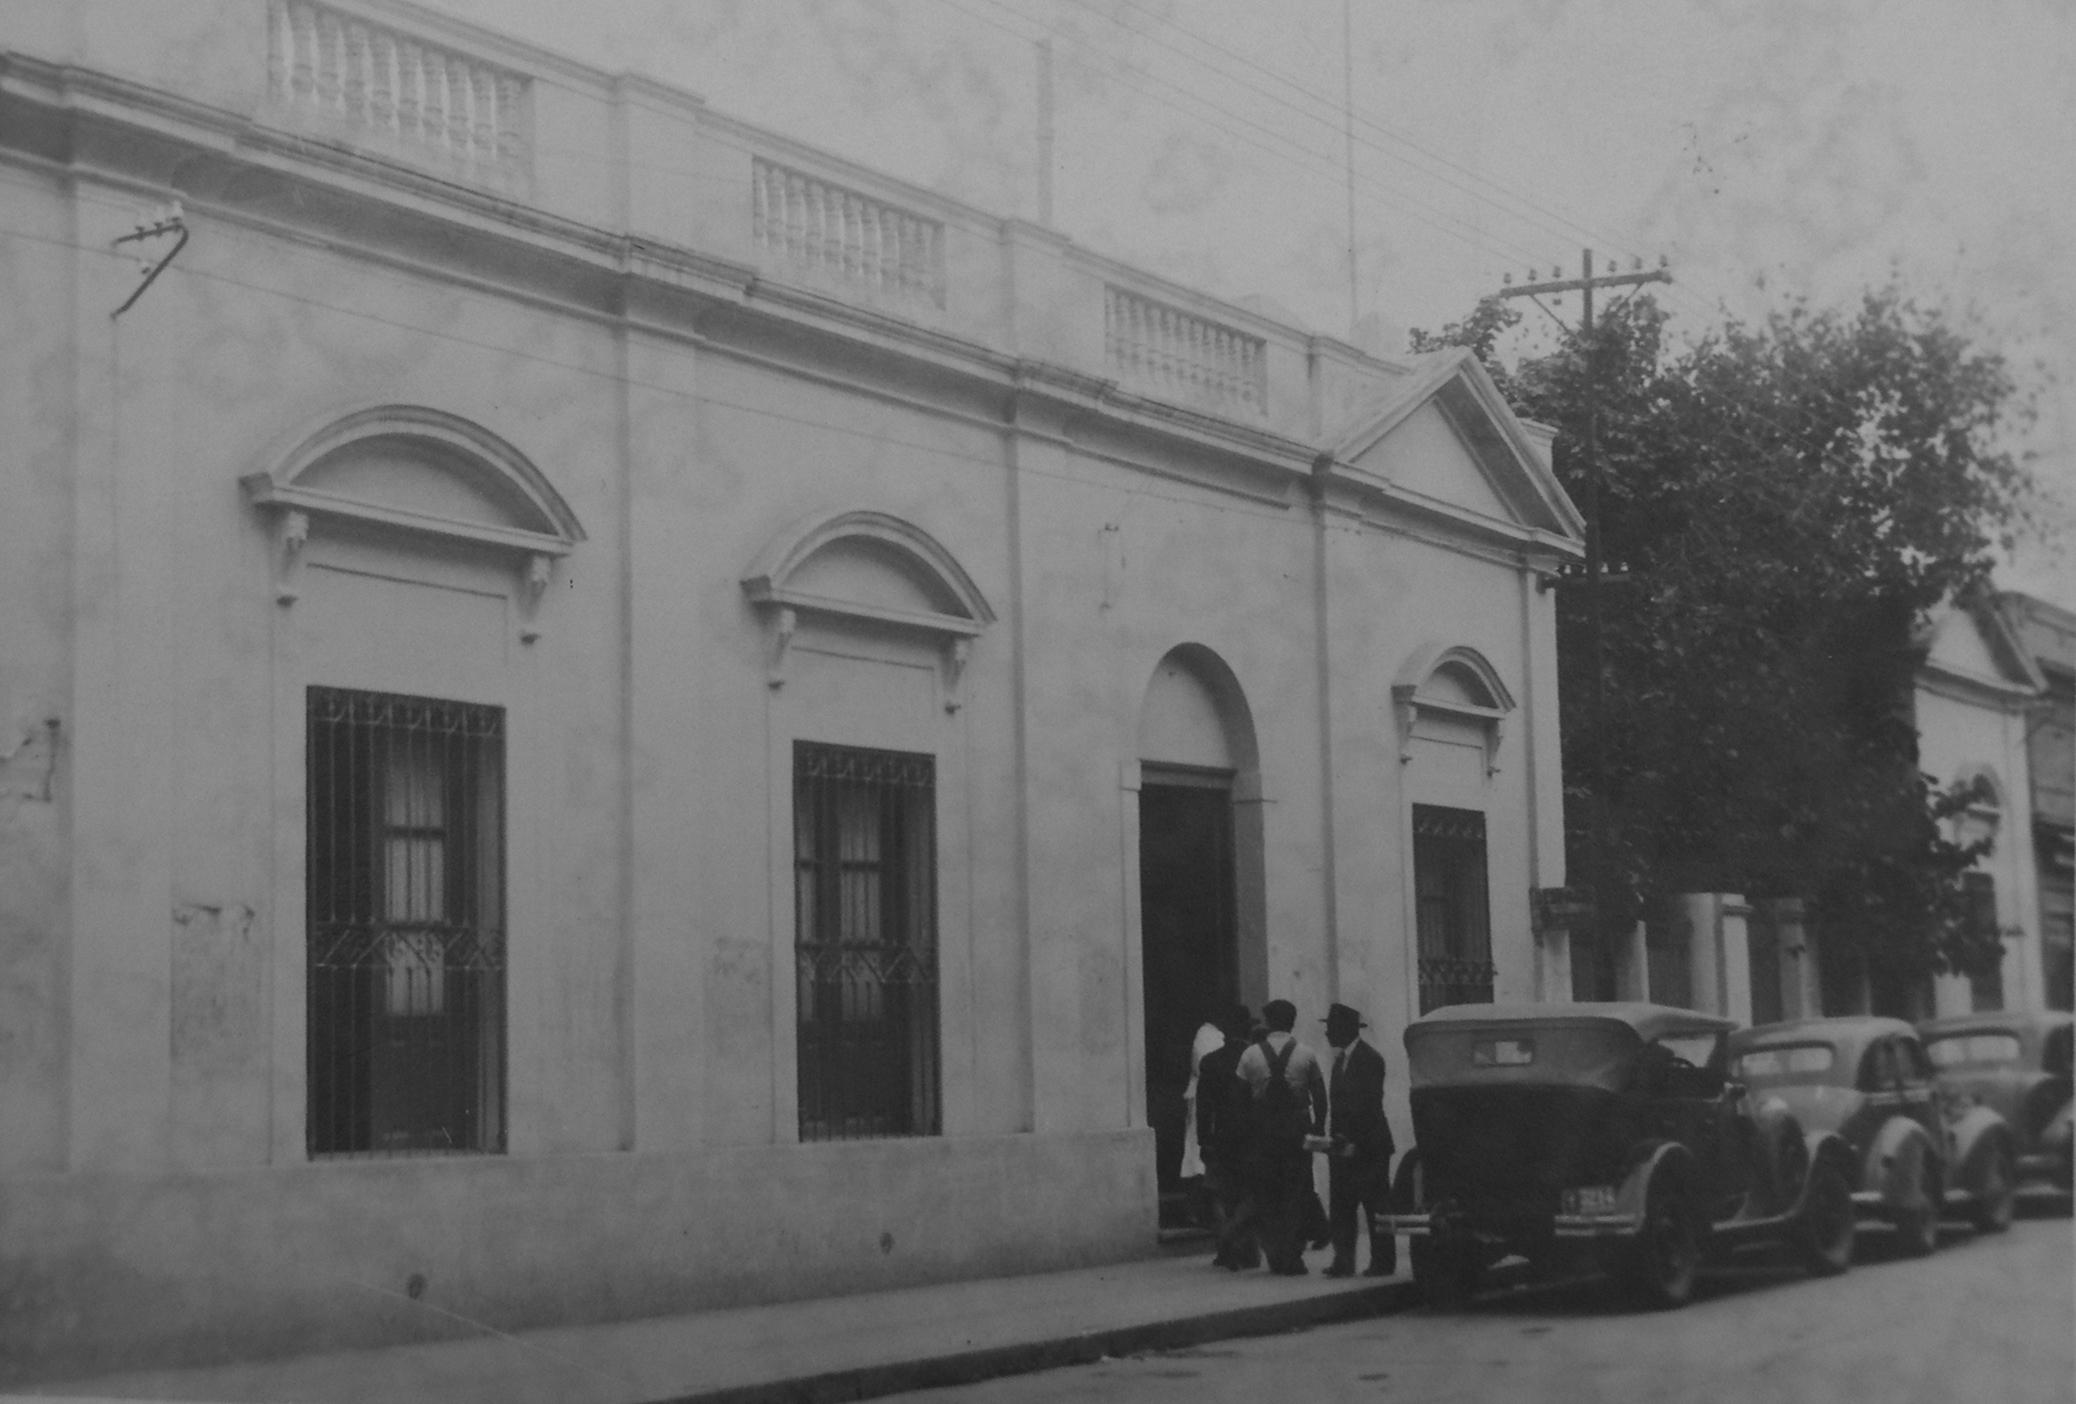 Escuela Normal Superior General Manuel Belgrano Cultura